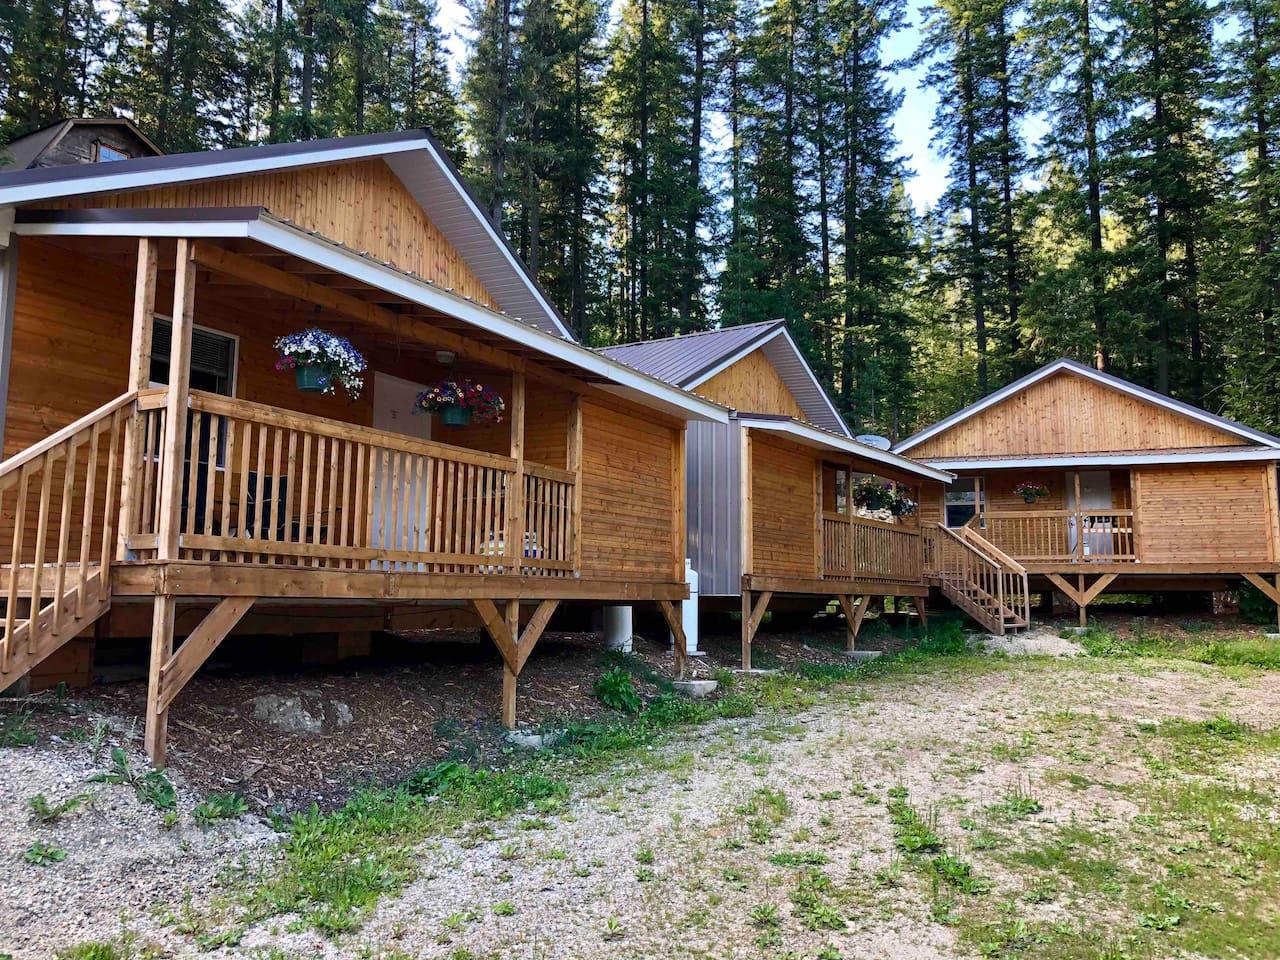 All three cabins.